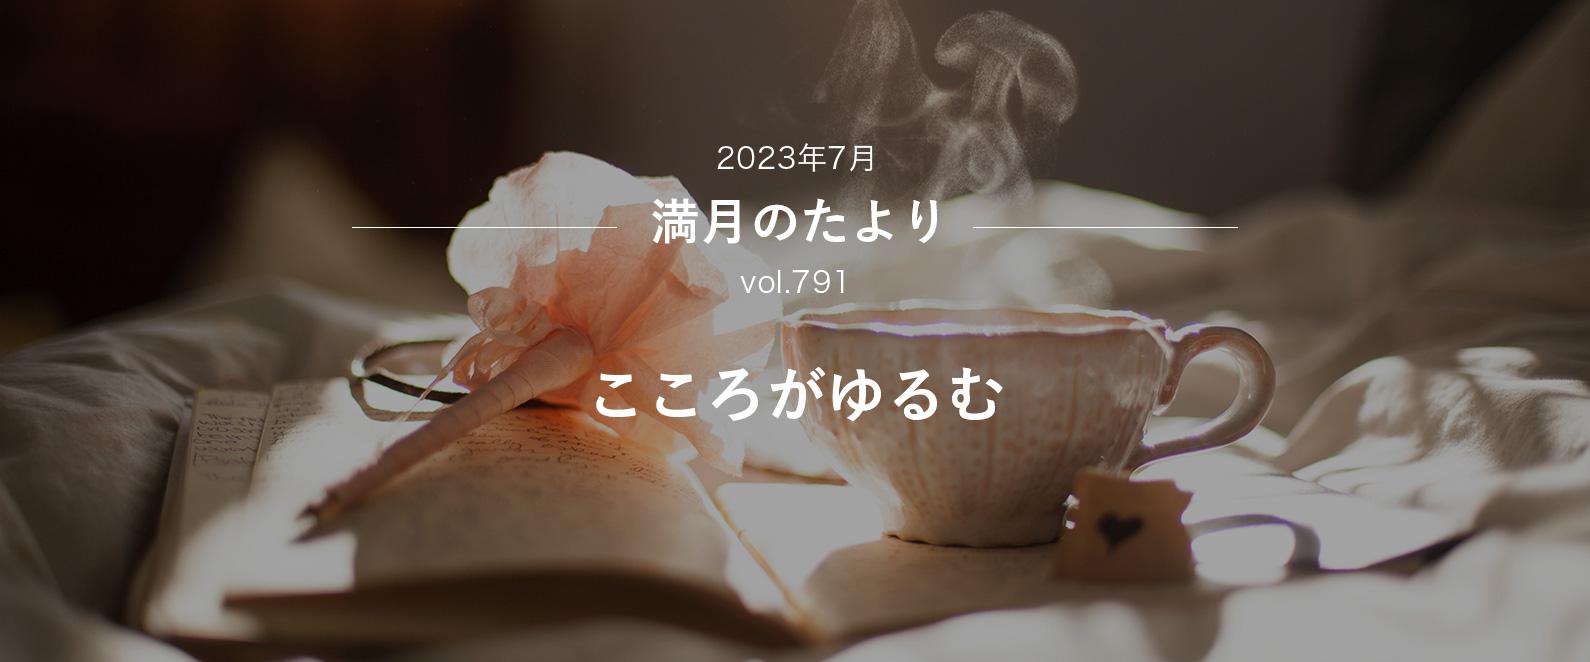 【Kai's Pick Up】13の月の暦&コズミック・ダイアリー特集